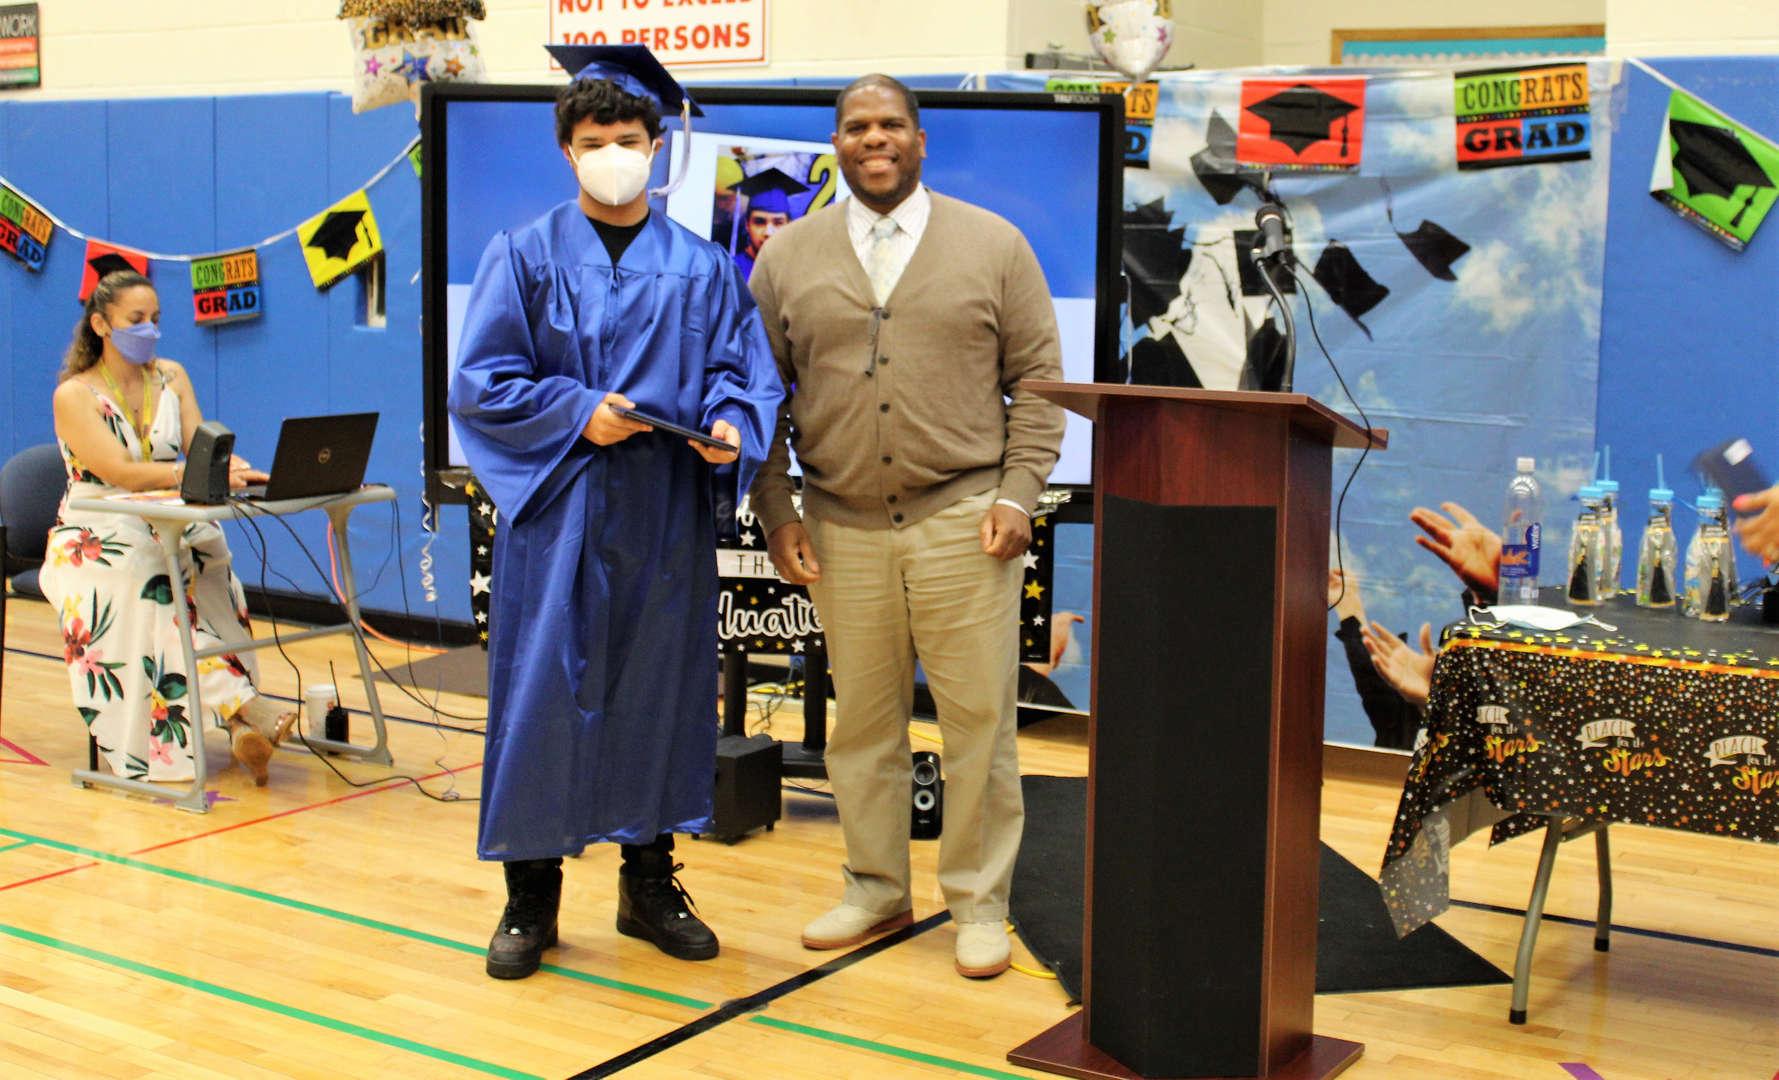 Rye Lake Middle/High School Principal Marvin Elliott poses with graduate David Nash.